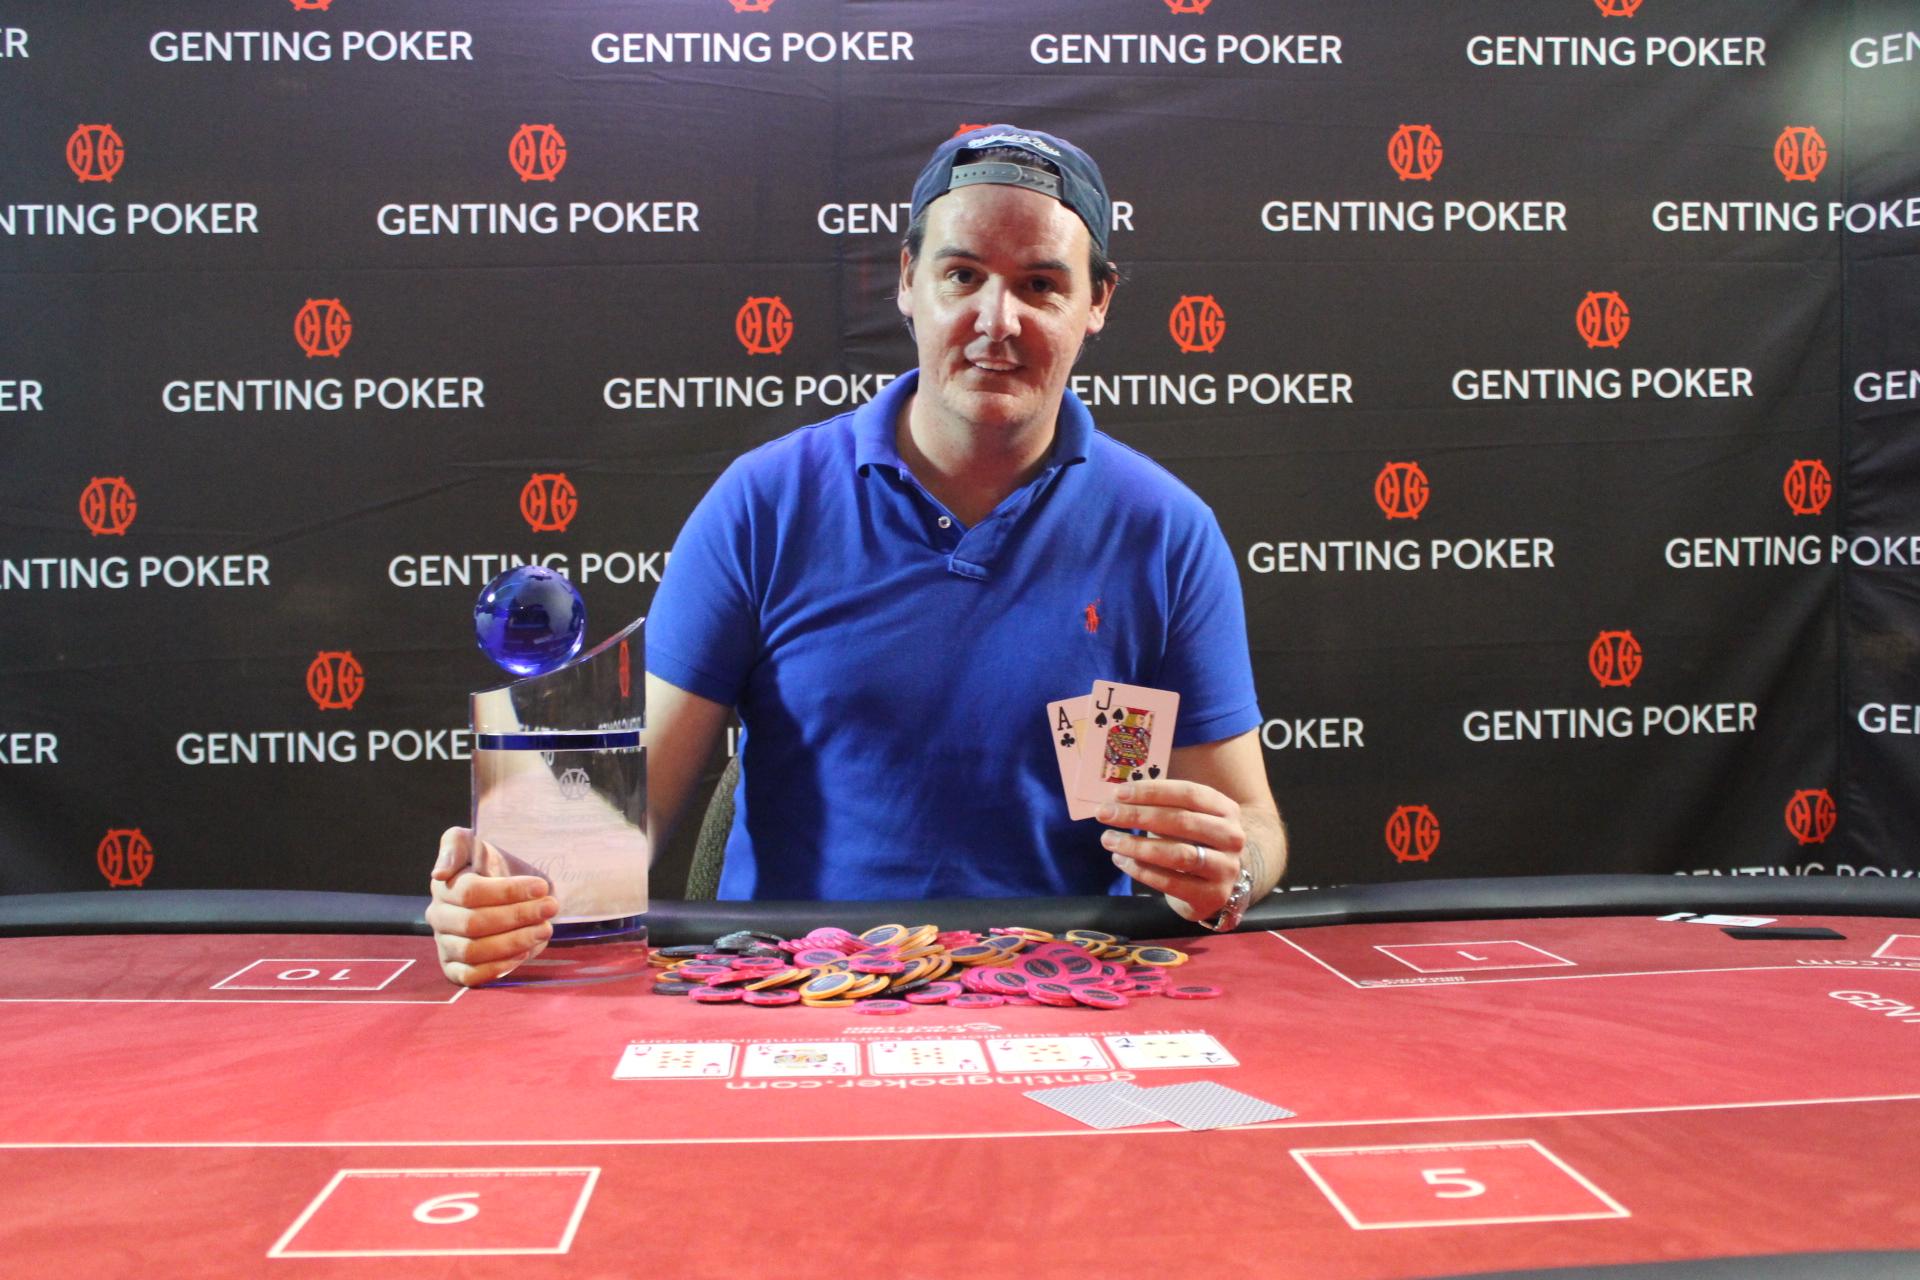 Genting poker edinburgh results the score poker tournament